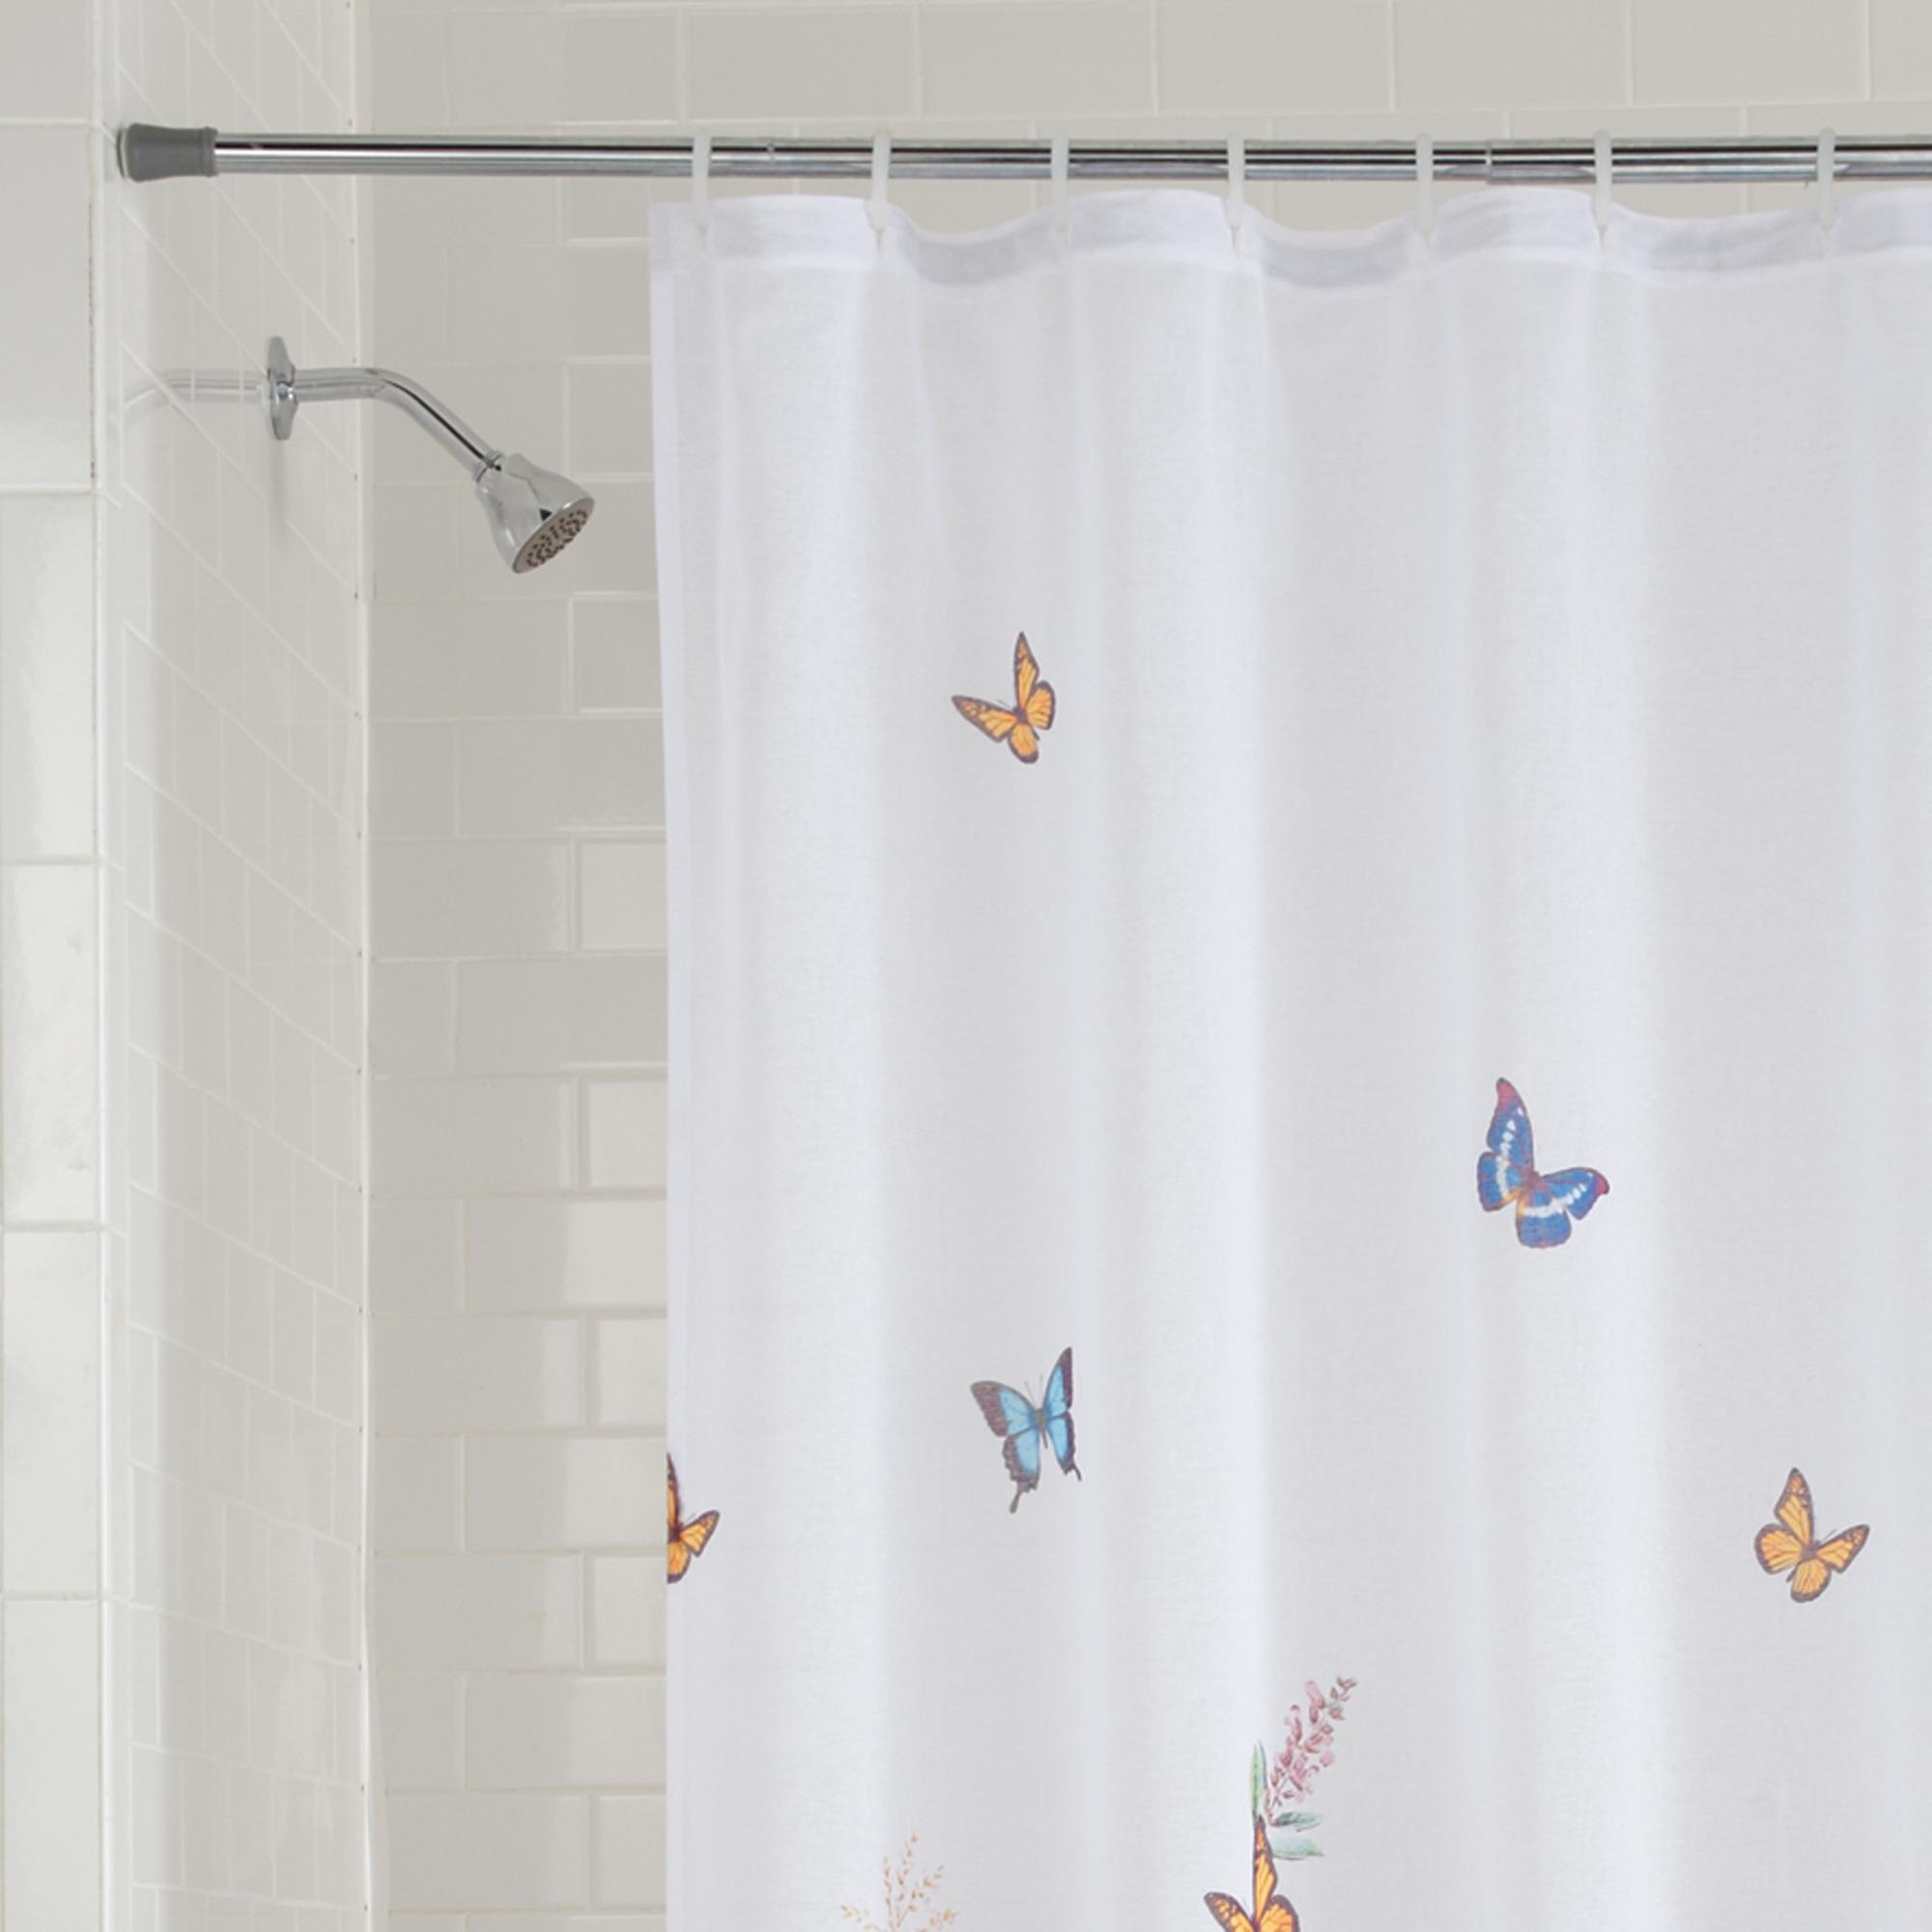 Butterfly Fabric Bathroom Bath Shower Curtain Blue Gold White